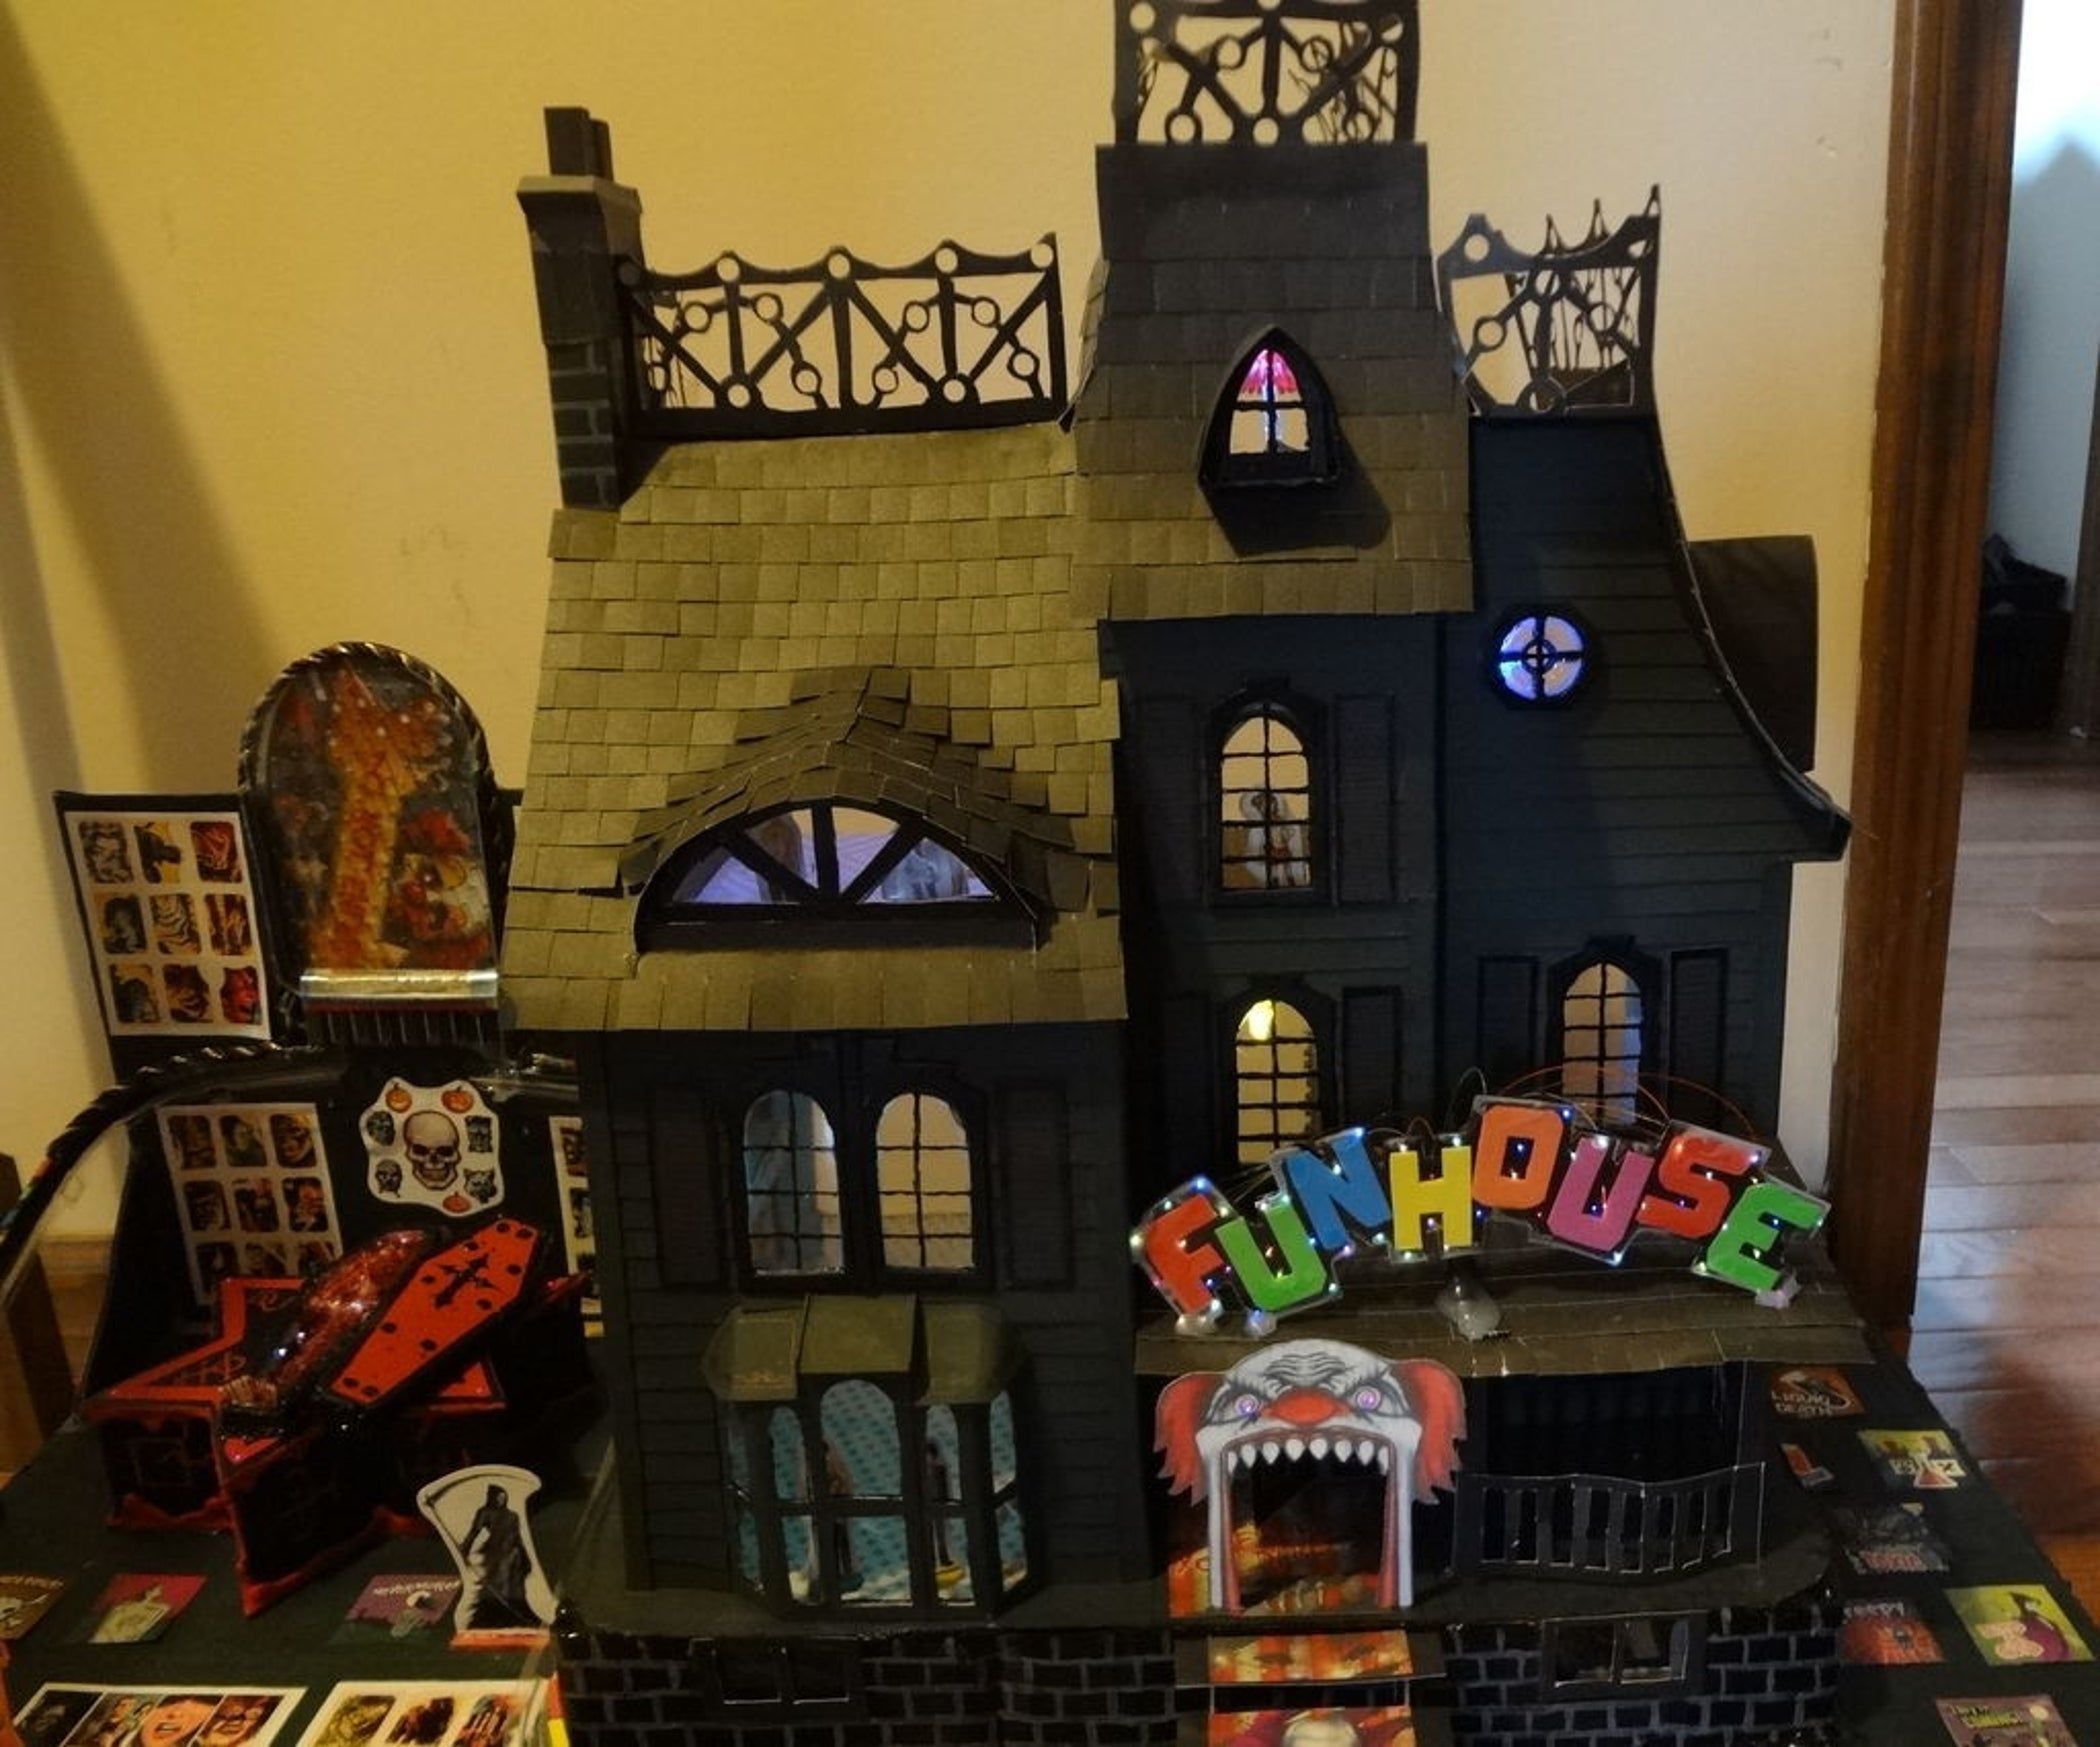 Cardboard Haunted House With Lights. Halloween house